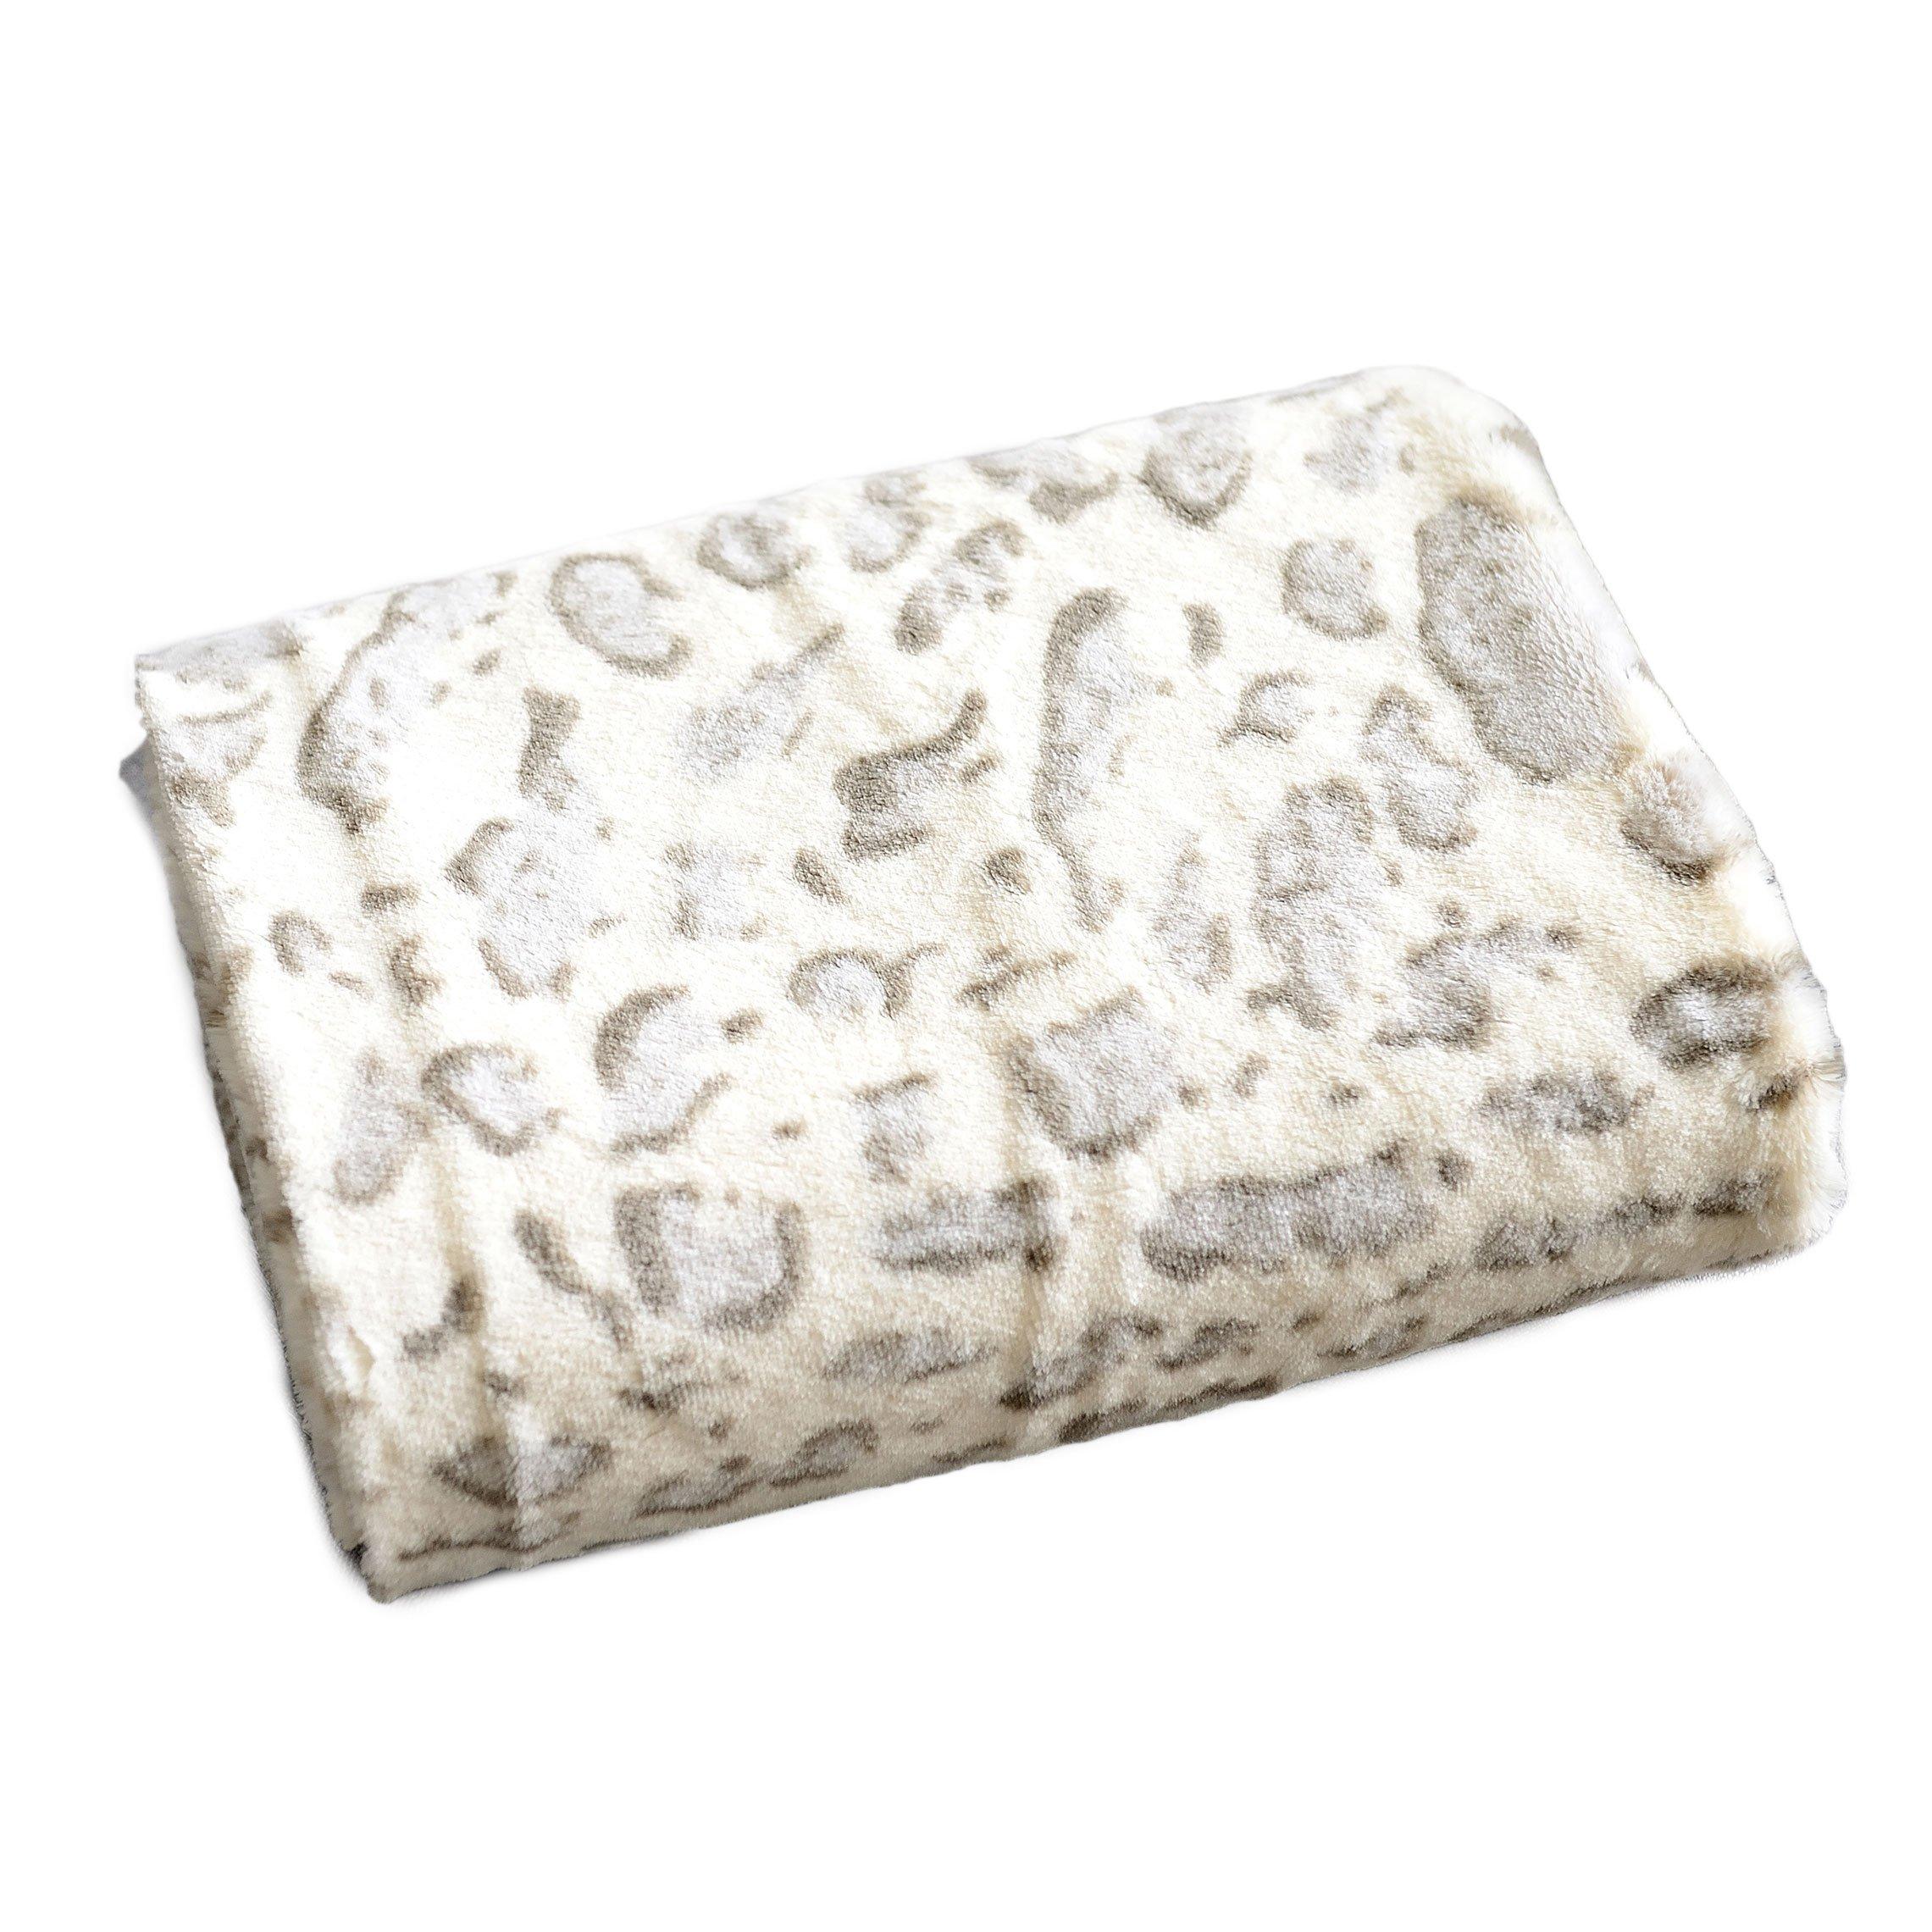 Cheer Collection Animal Print Throw Blanket   Soft Velvety Faux Fur Microplush Reversible Cozy Warm Throw Blanket - 60'' x 70'' - Snow Leopard